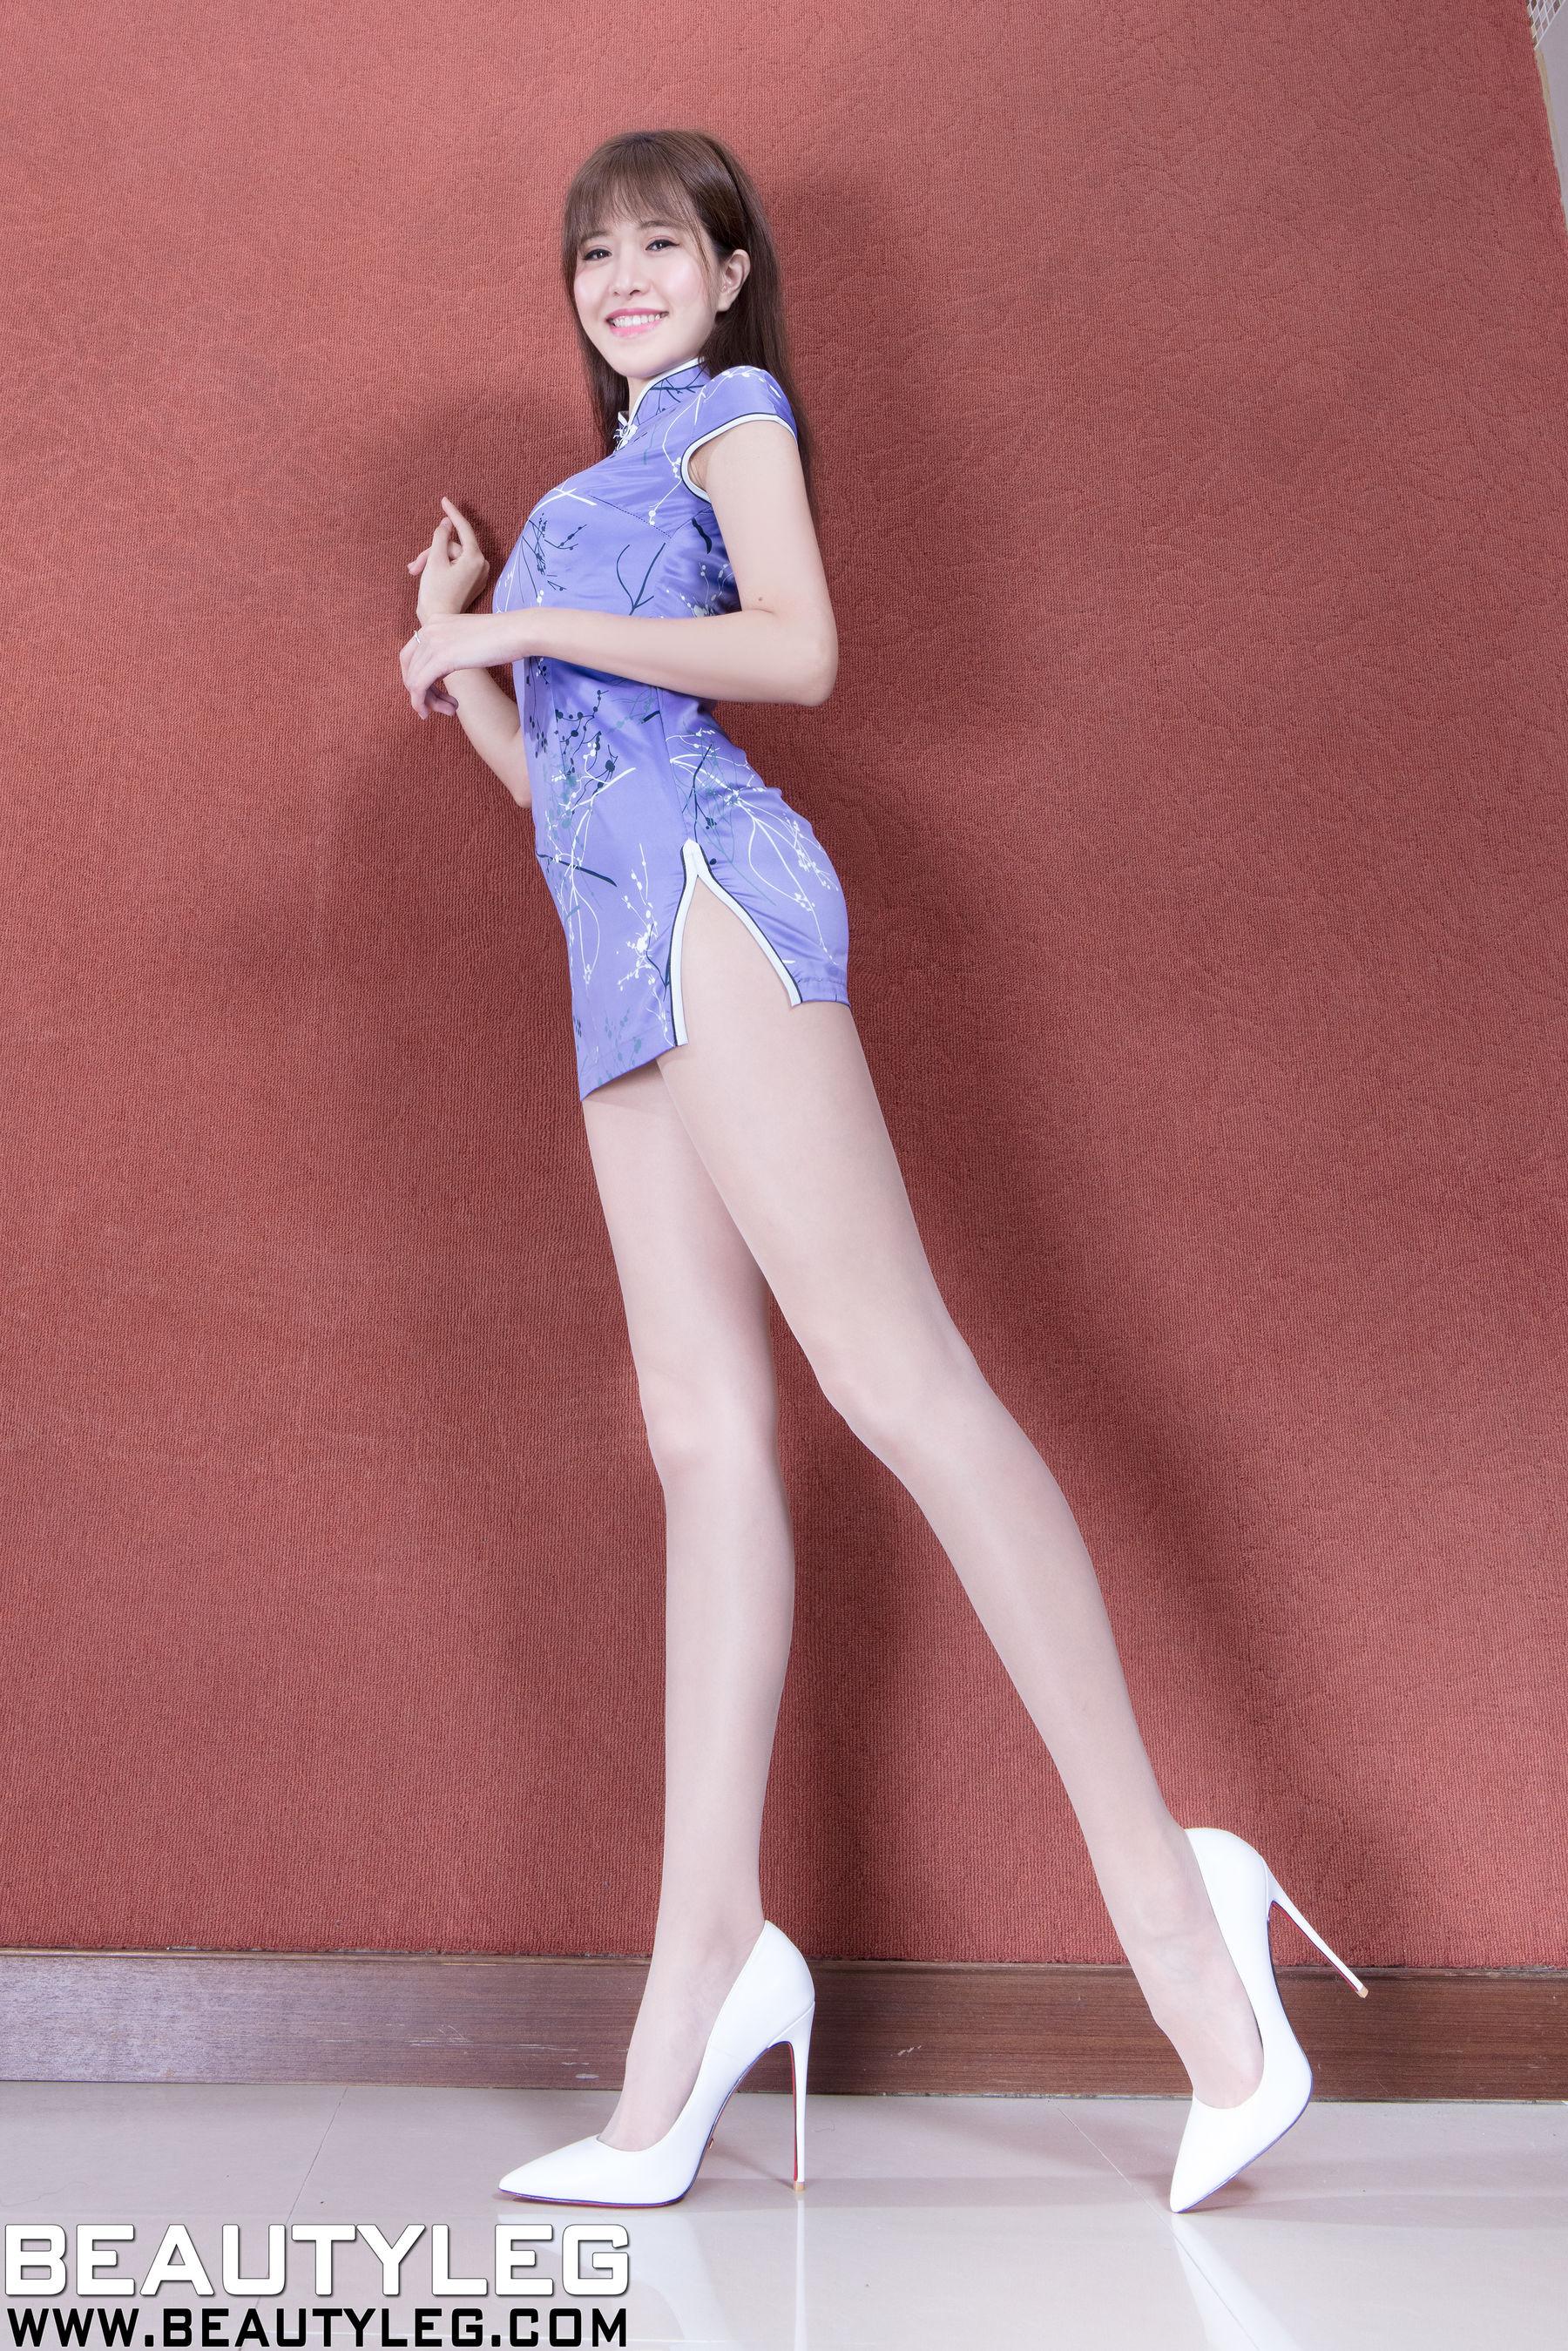 VOL.554 [Beautyleg]旗袍高跟肉丝袜:张欣慈(腿模Olivia)超高清个人性感漂亮大图(81P)